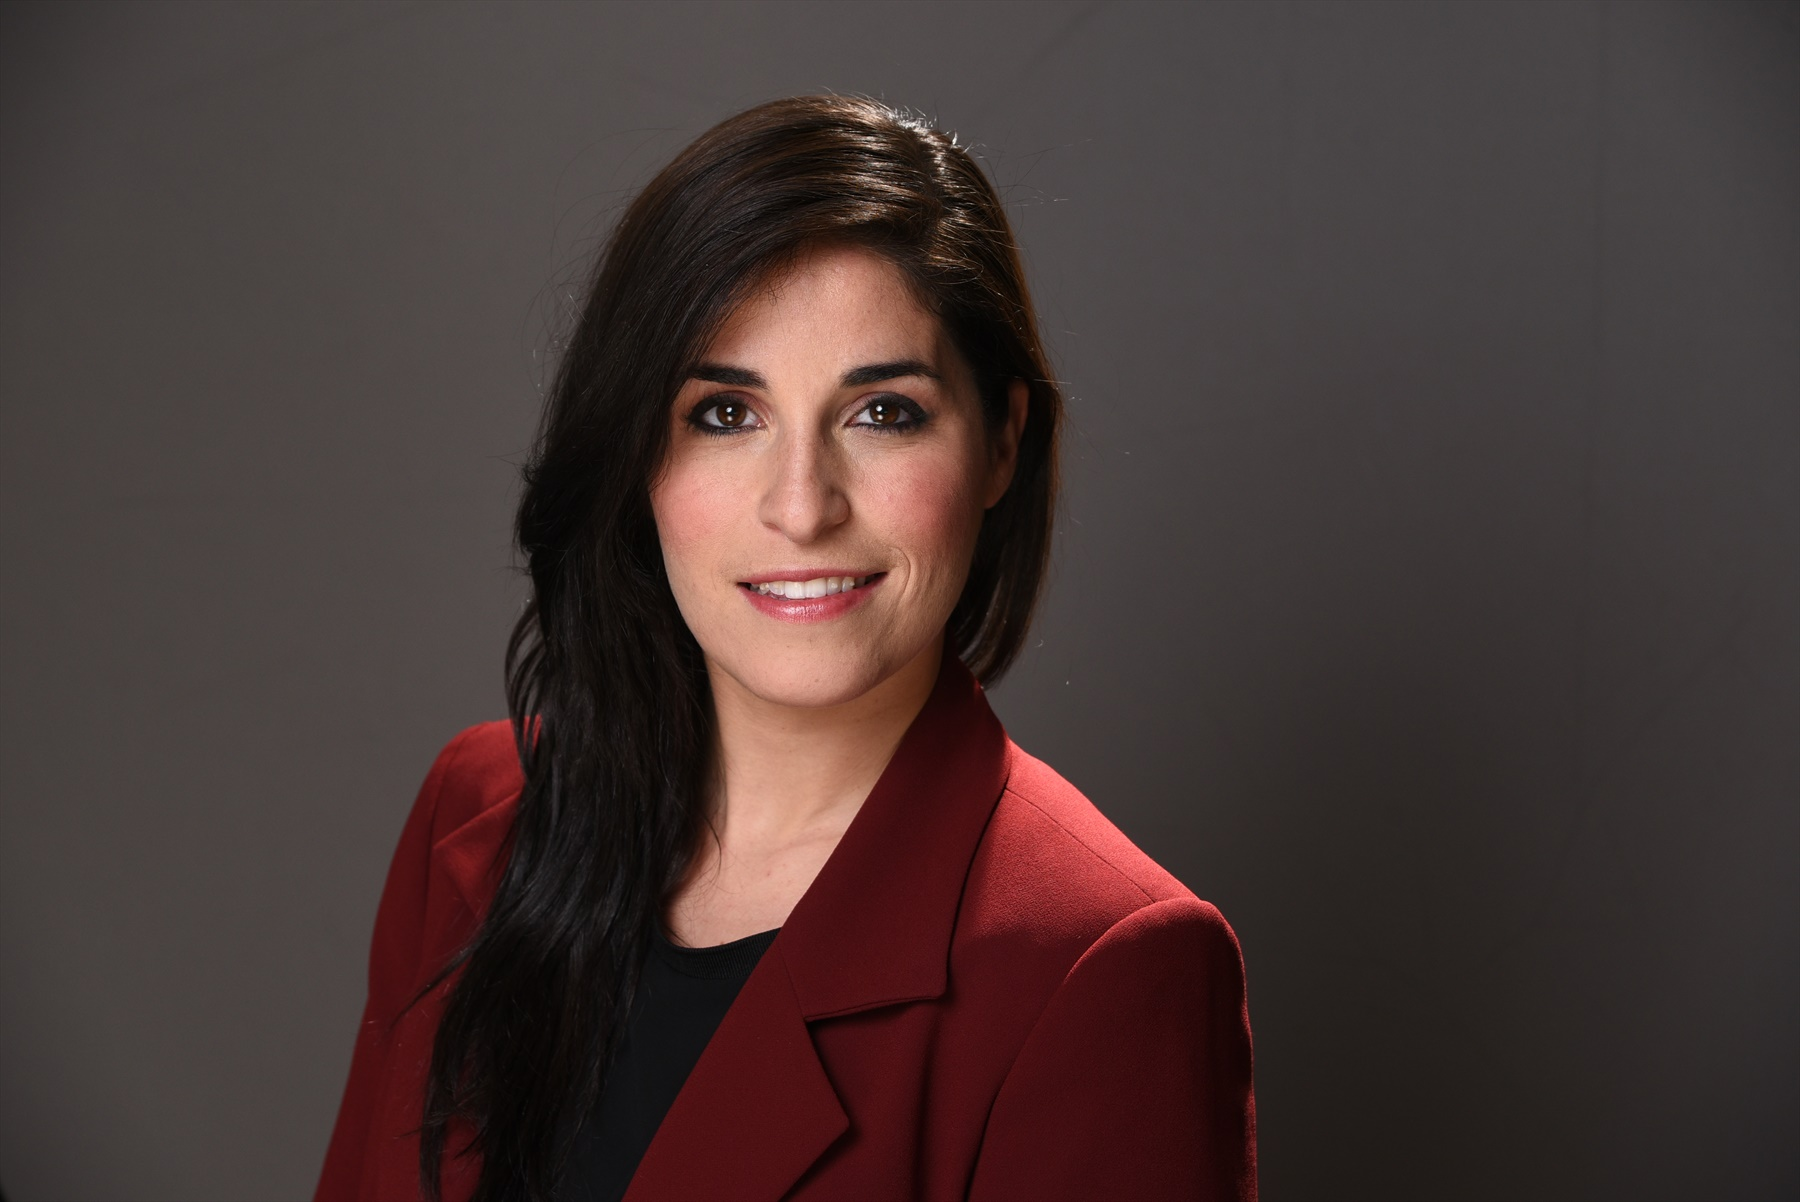 Beatriz Parra